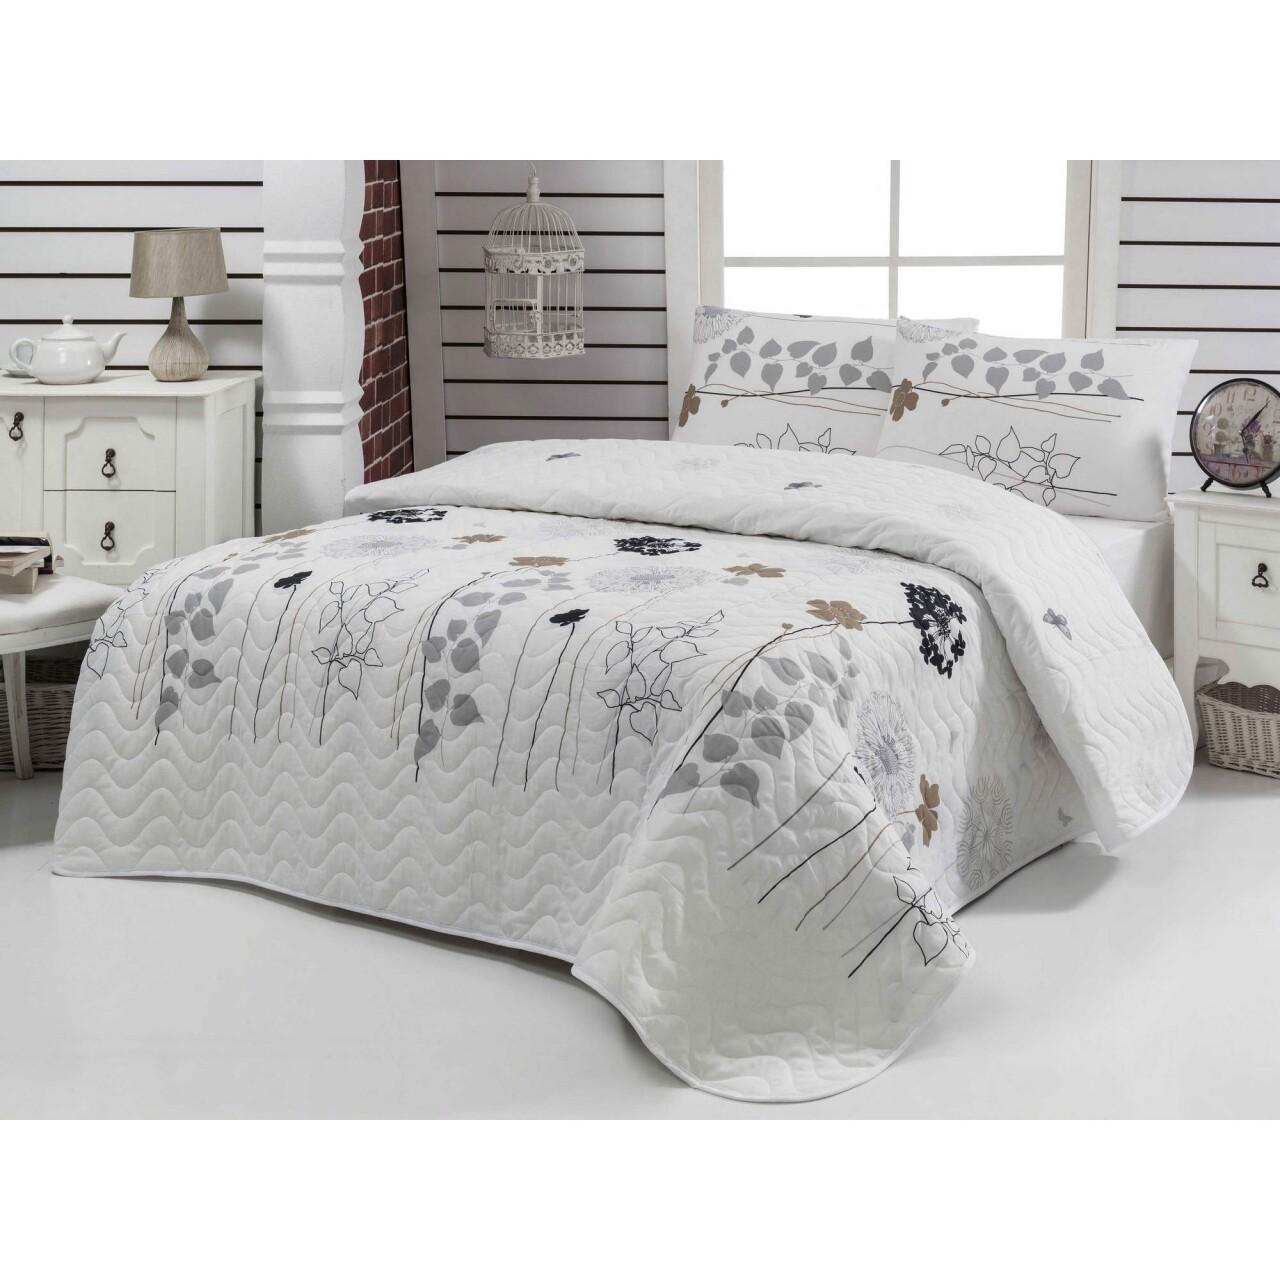 Set de pat double Atlantis White